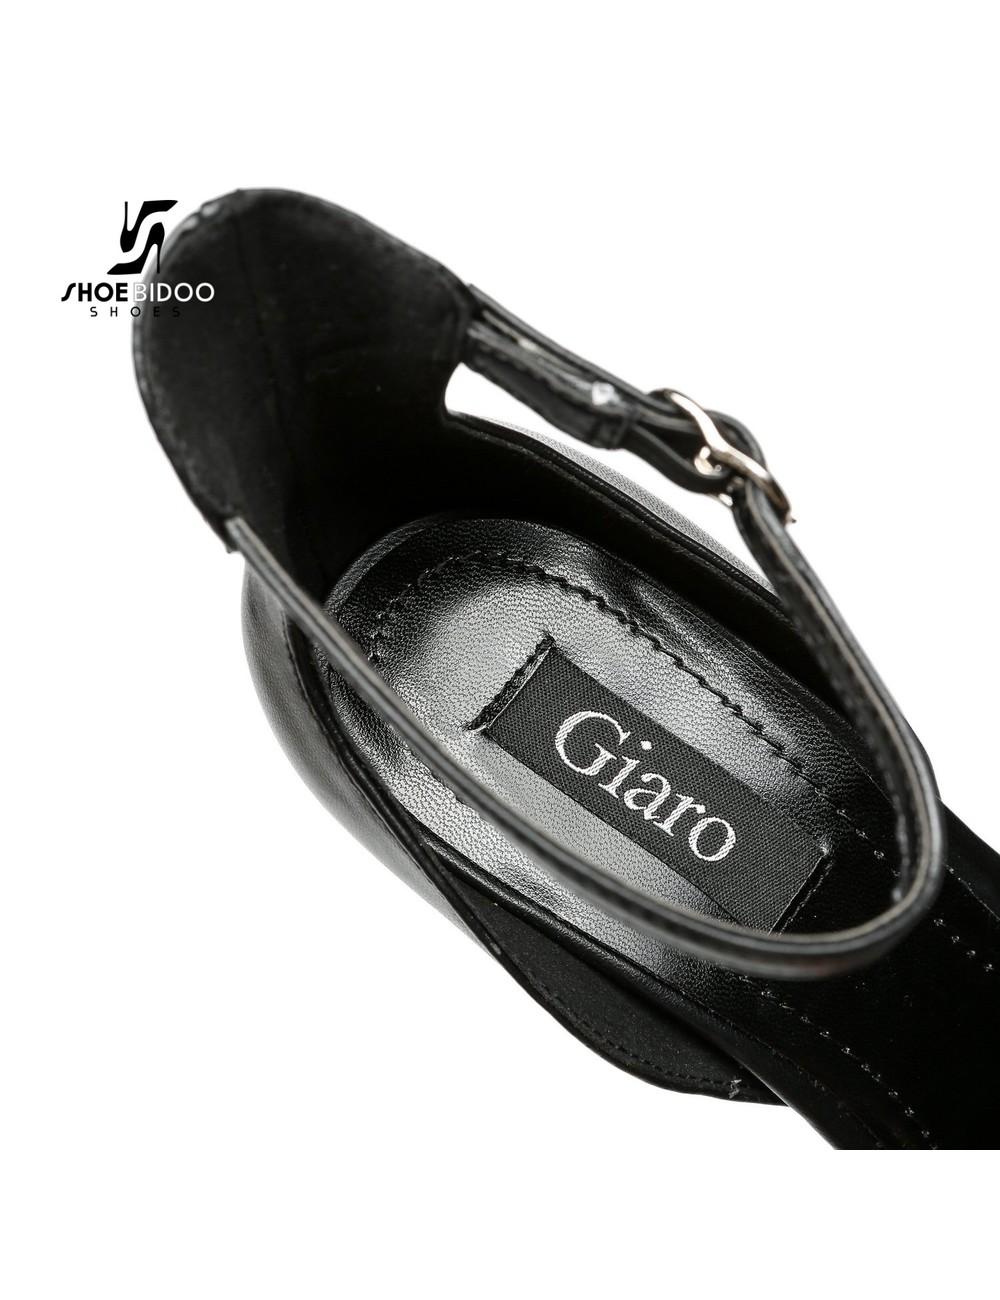 Giaro Zwarte Giaro MINA sandalen met hoge enkelriem